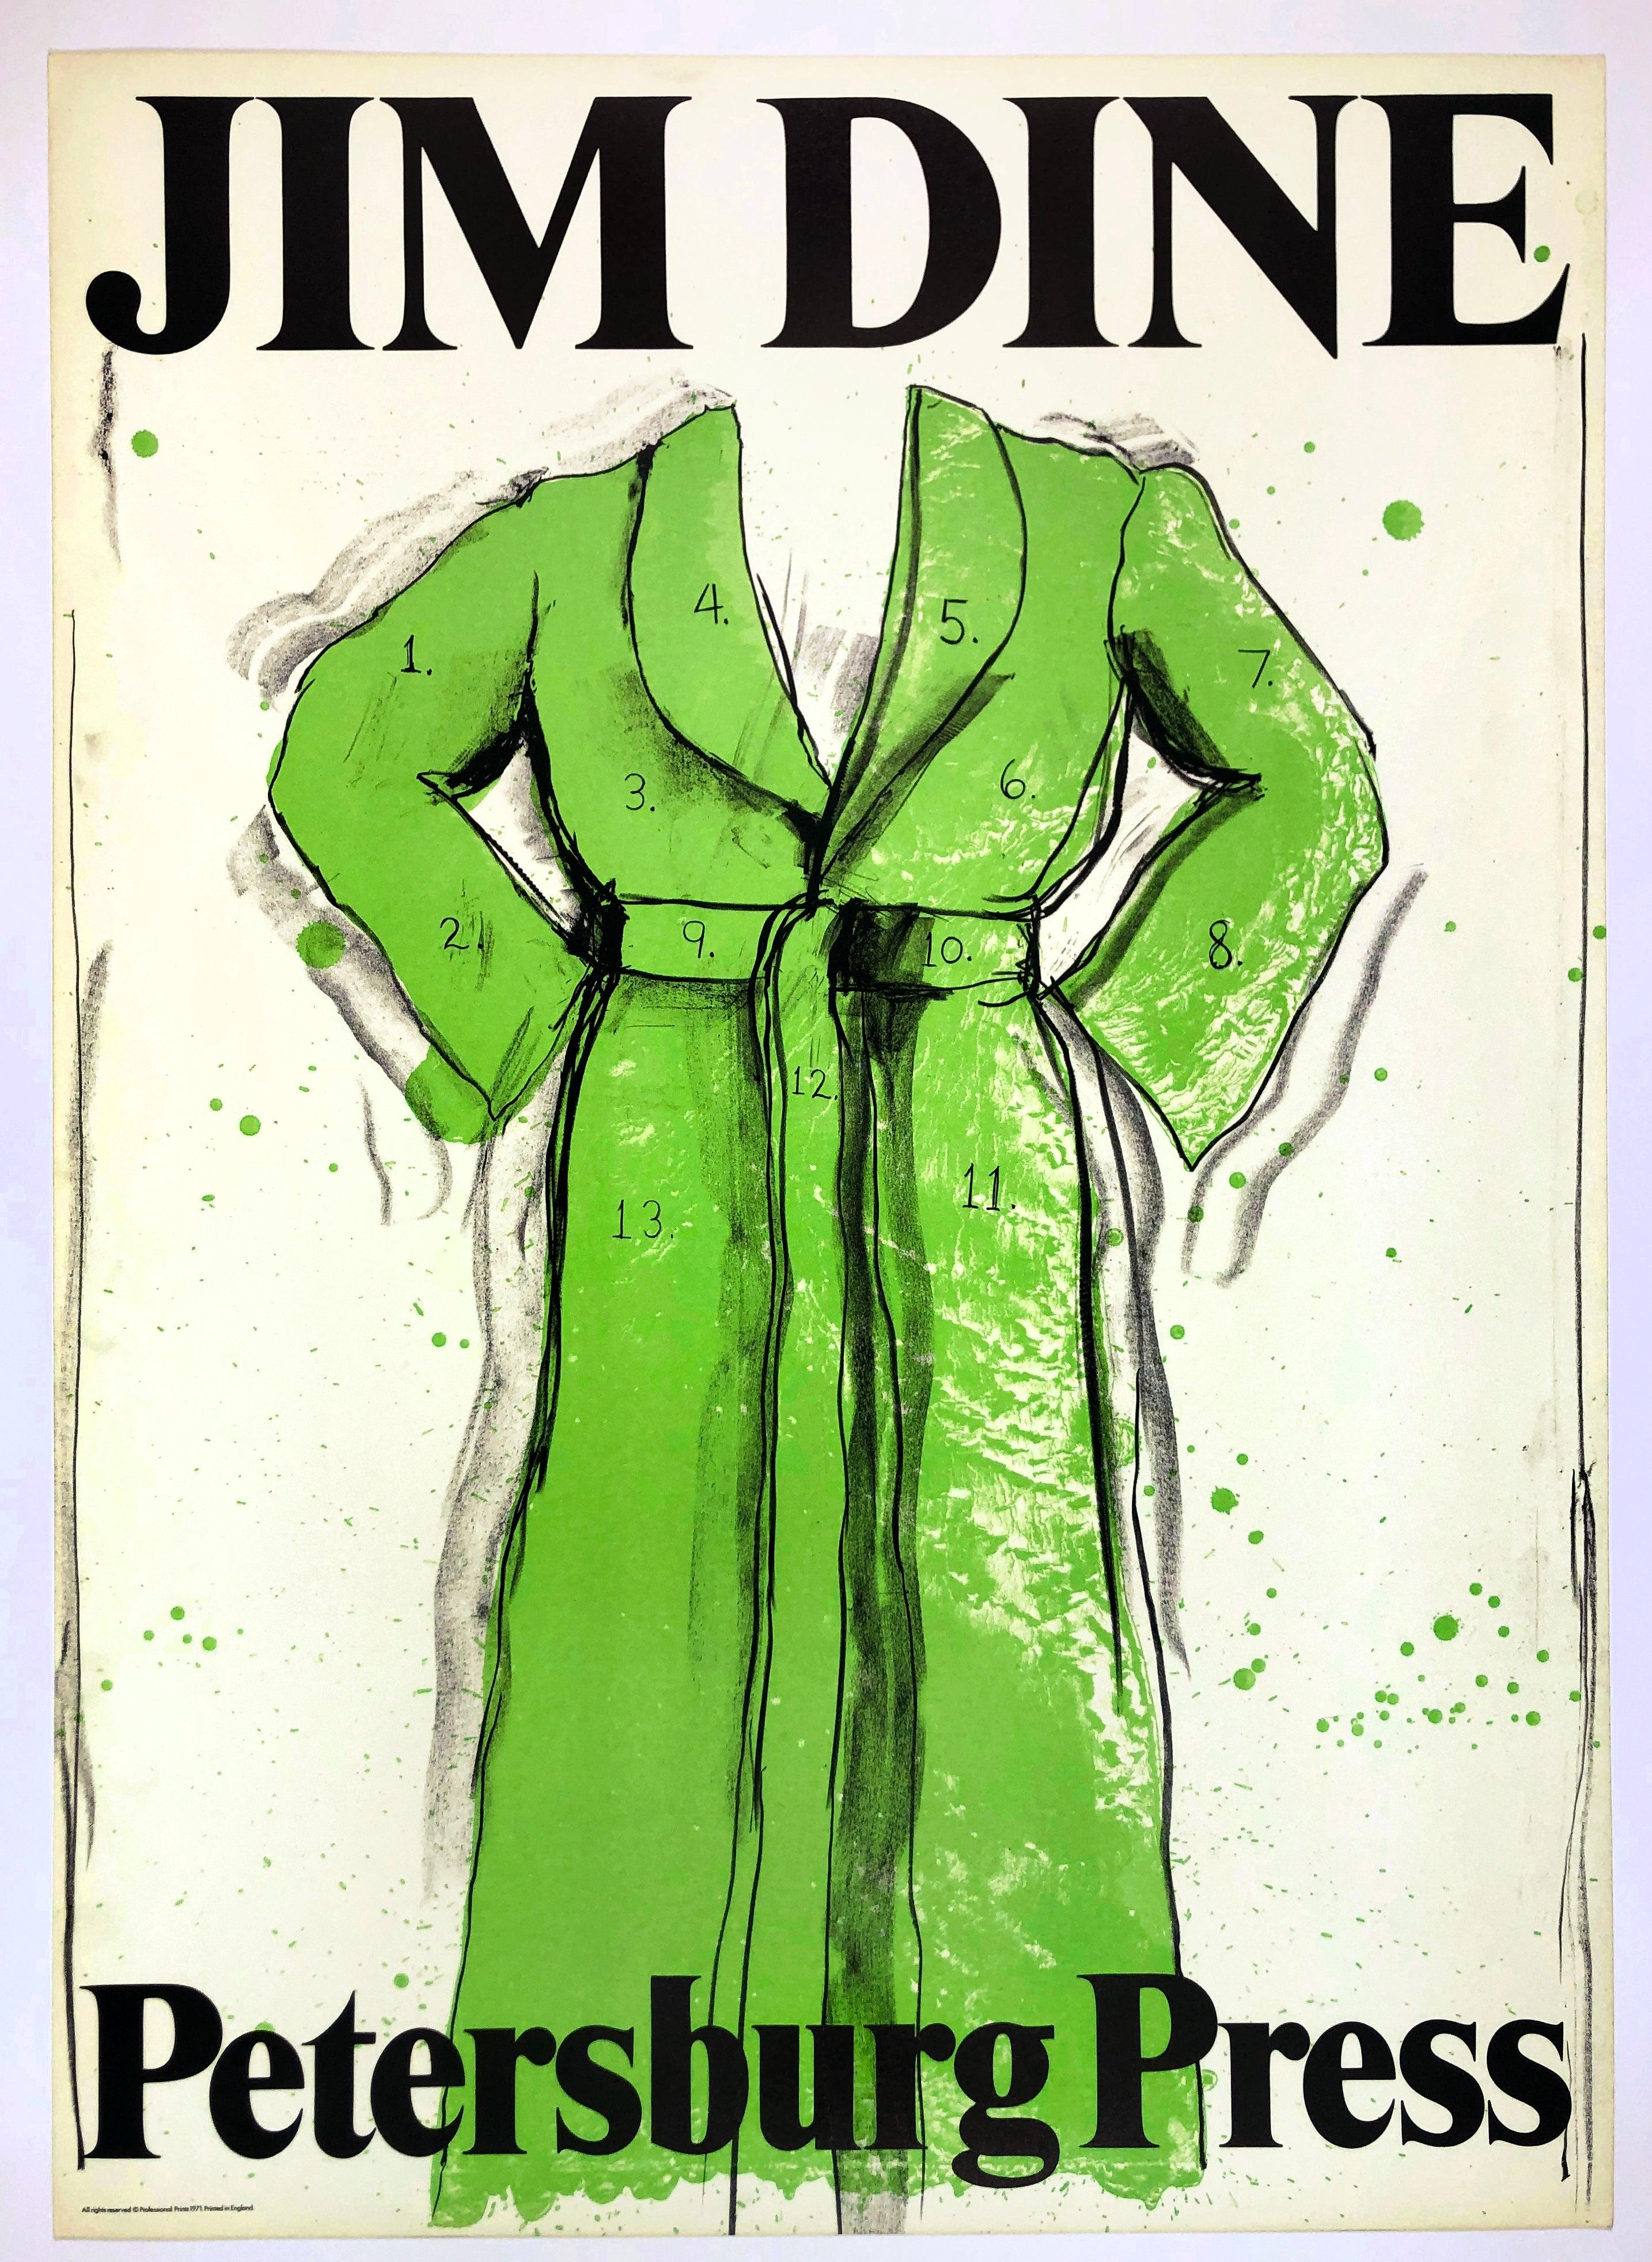 Vintage Jim Dine Green Bathrobe exhibition poster, 1970s retro art font